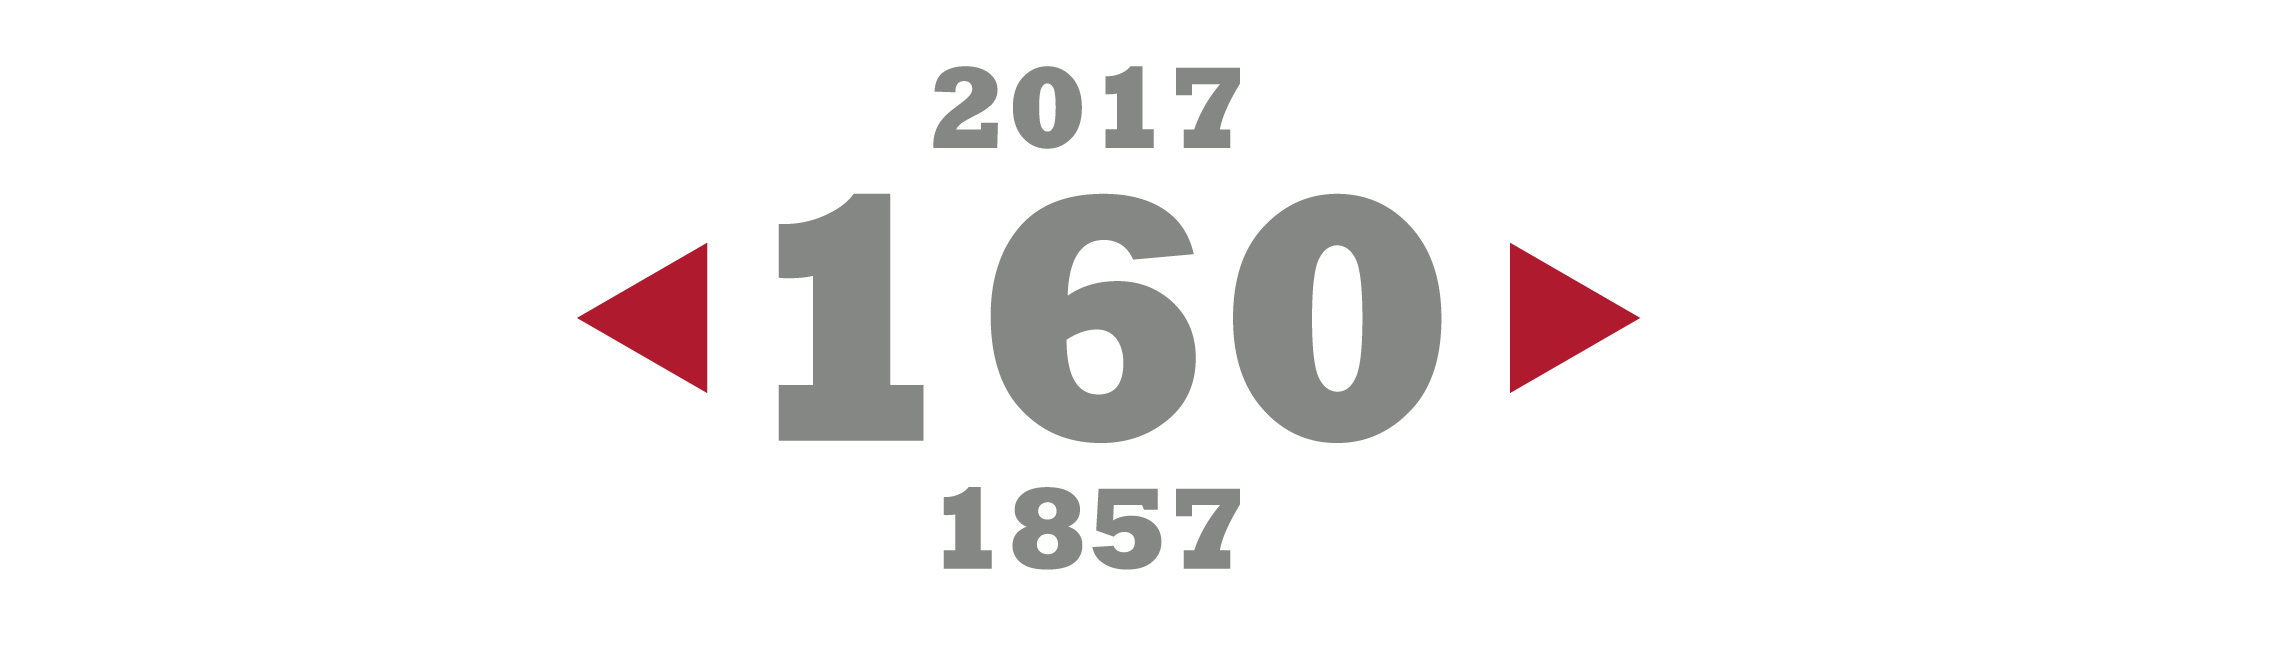 zinkgruvan 160 logoförslag 161107